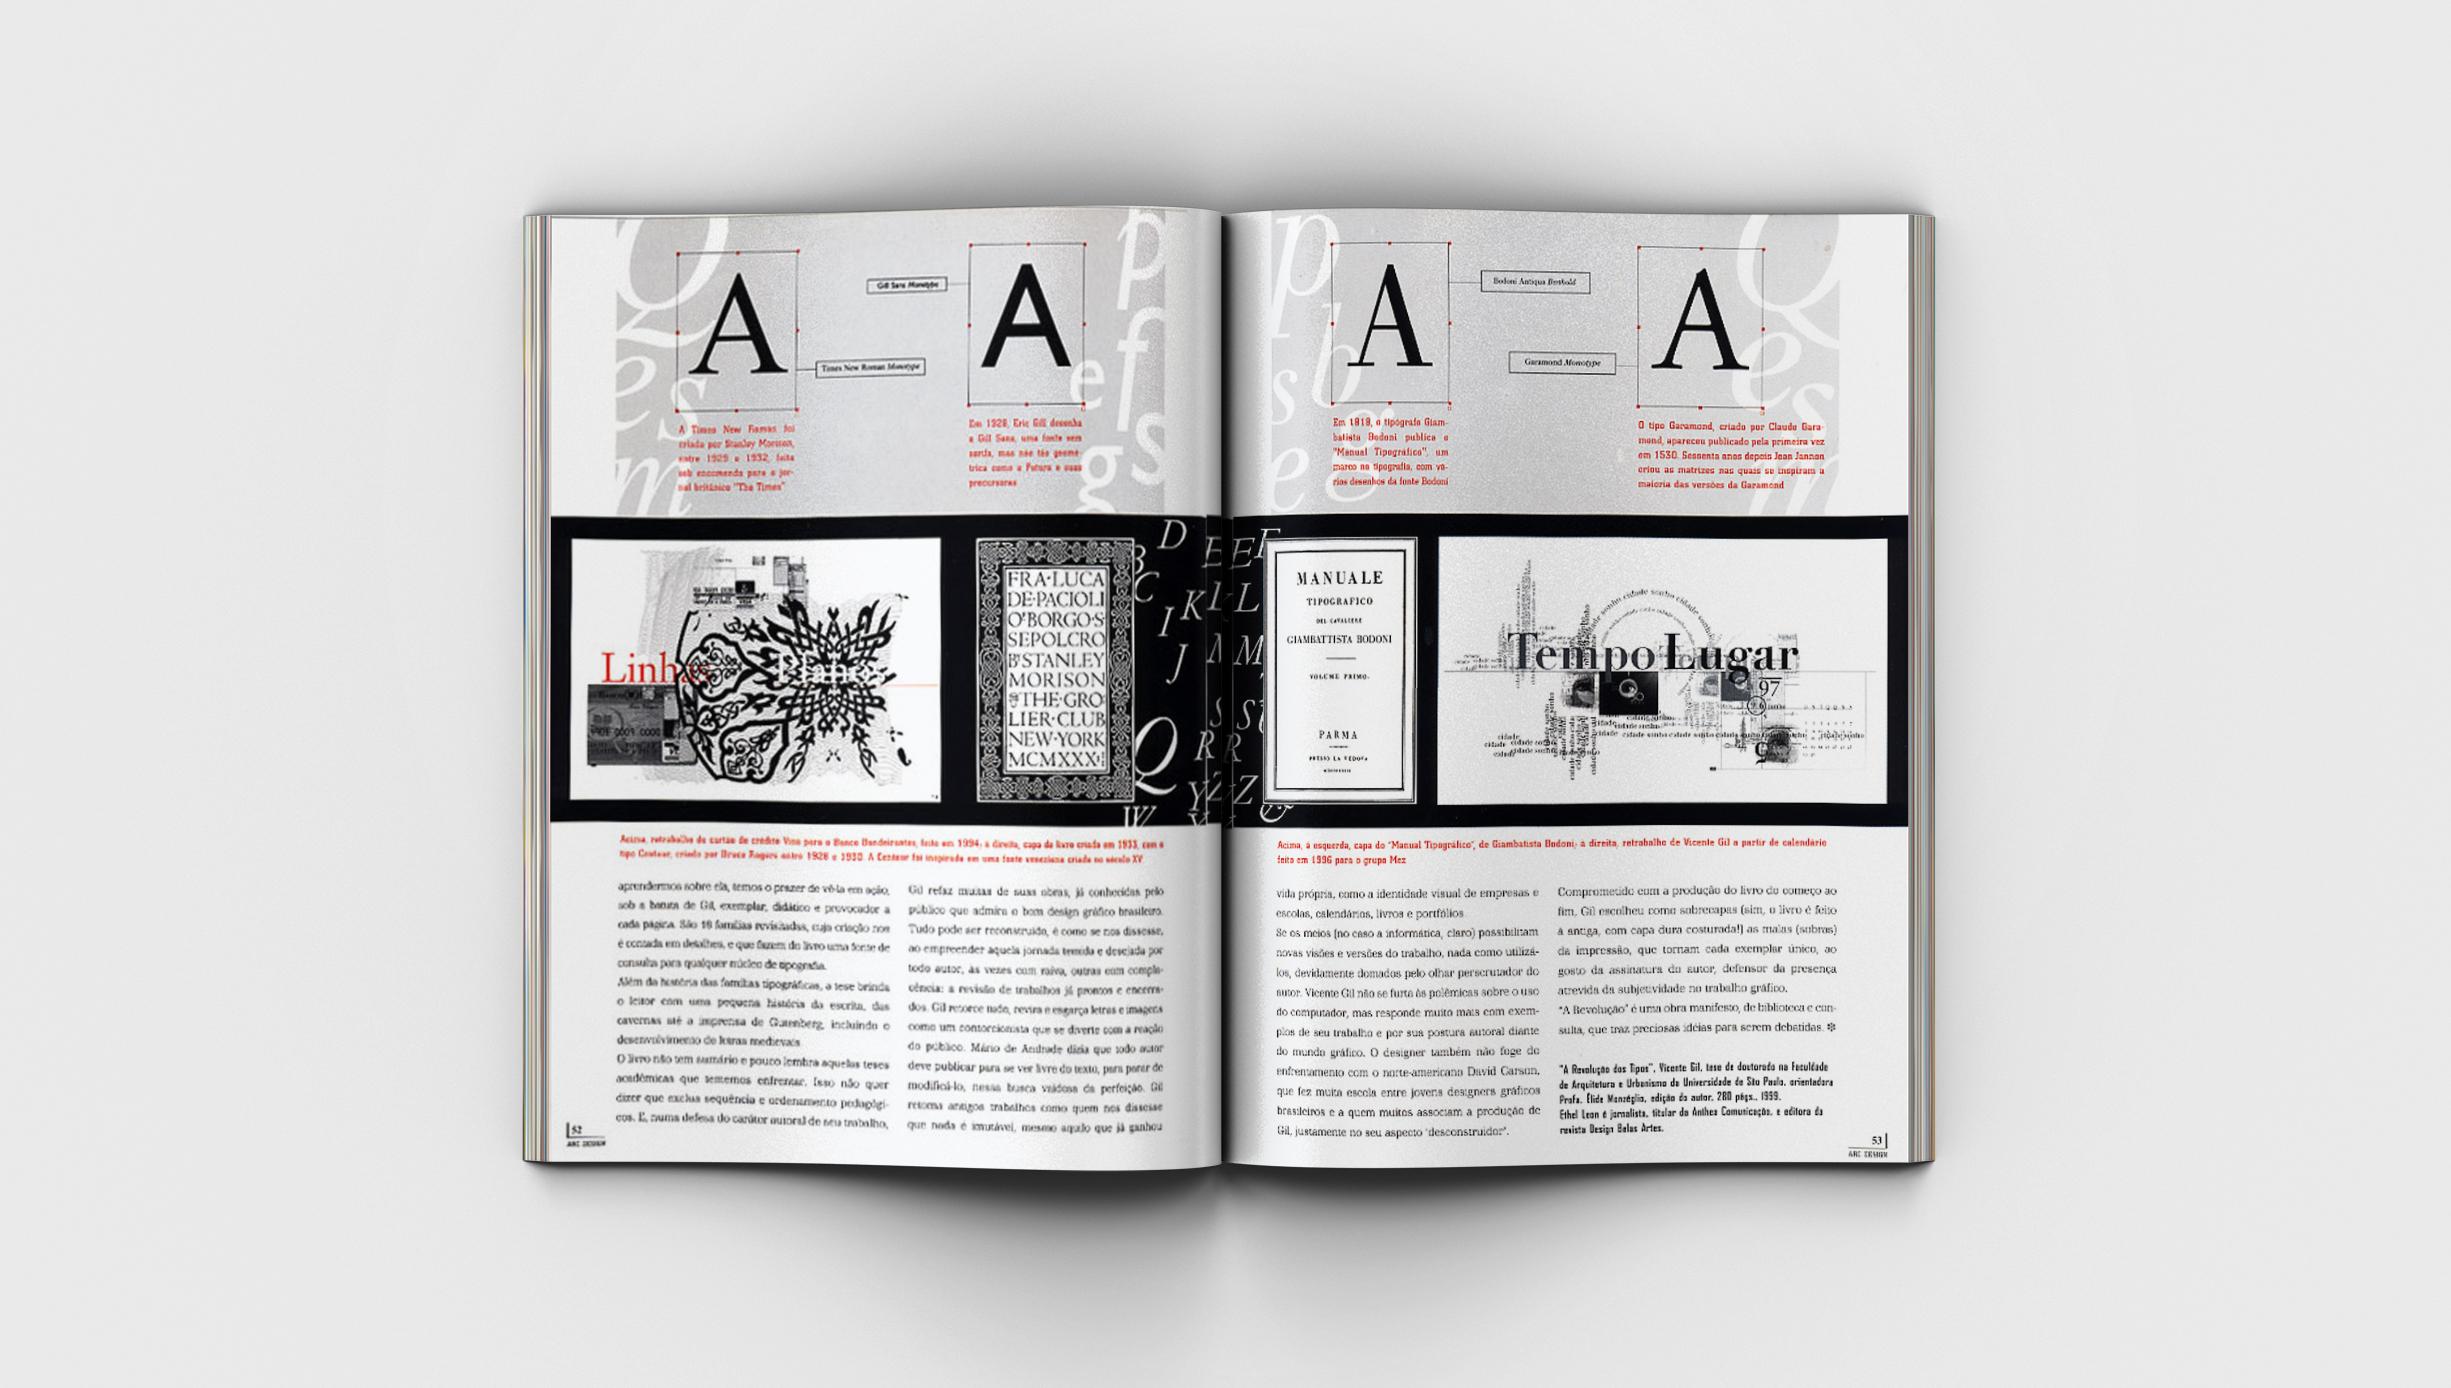 arc_magazine_2.jpg